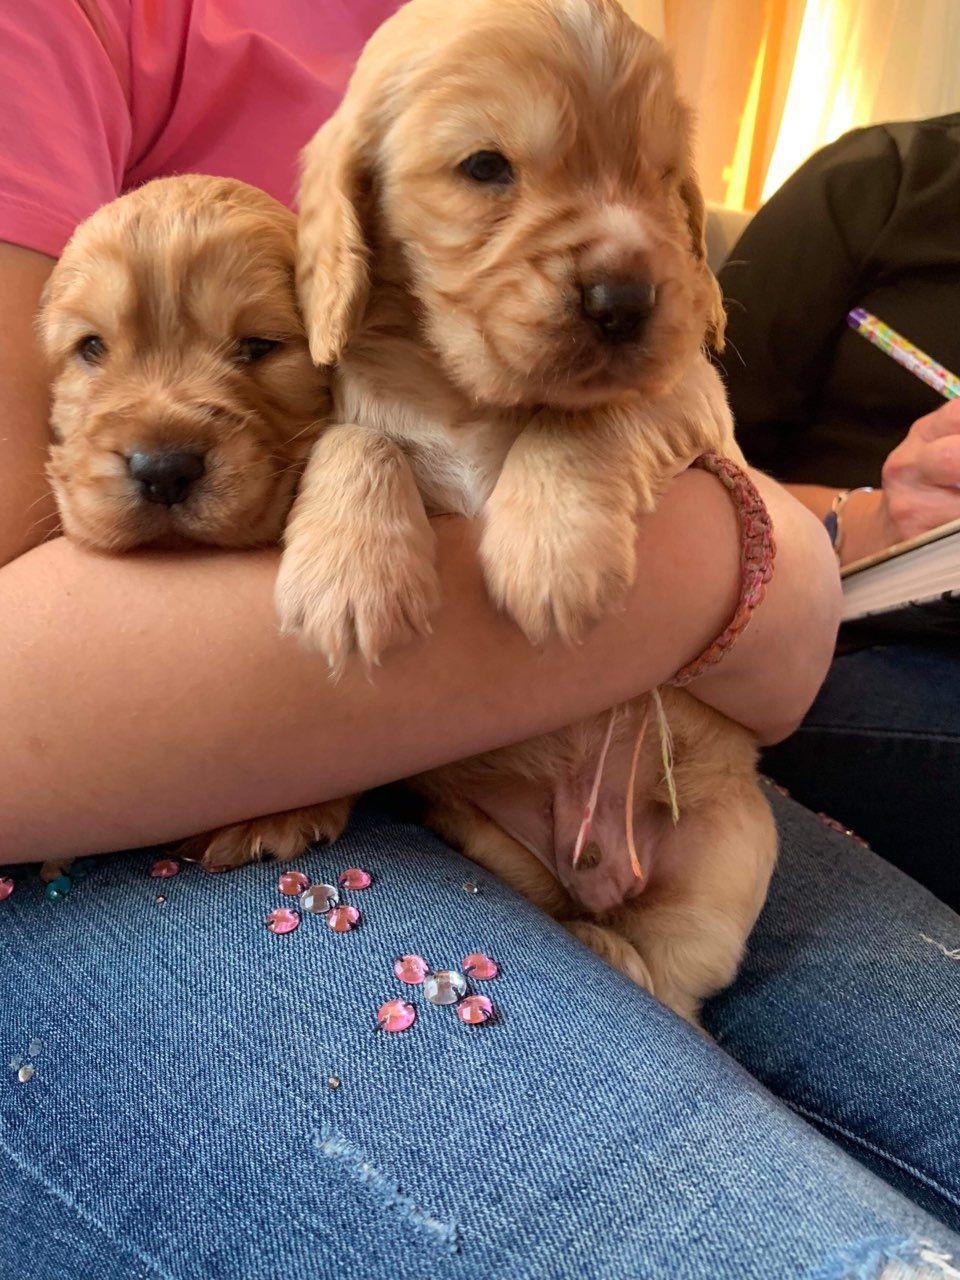 Cocker spaniel puppies Cocker spaniel puppies, Spaniel